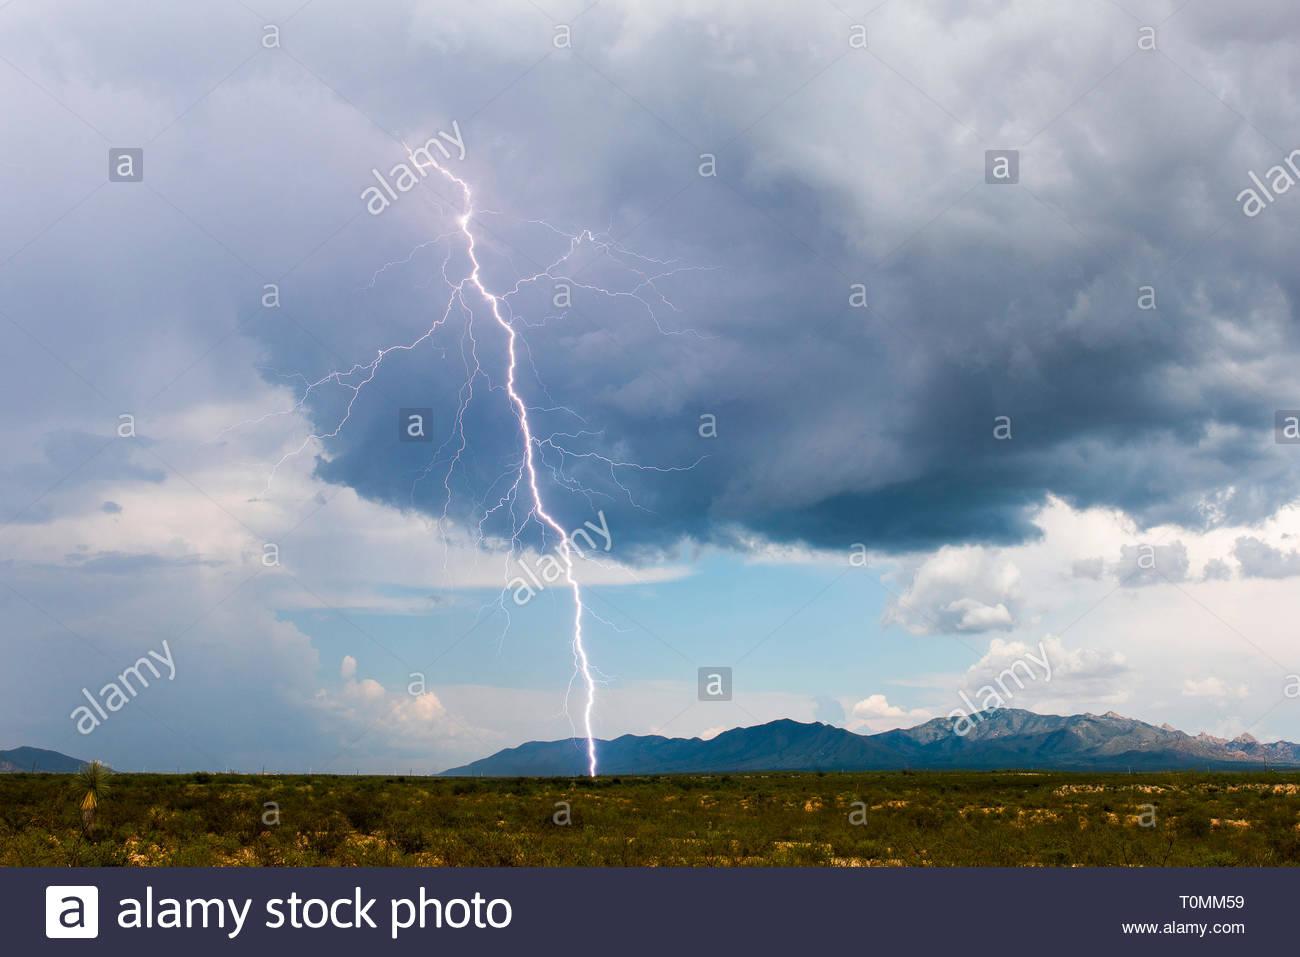 Blitzschlag bei Tageslicht am 08.08.2018 nahe der Dragoon Mountains, Cochise County, Arizona, USA|Lightning strike in daylight on 08.08.2018 near Drag - Stock Image